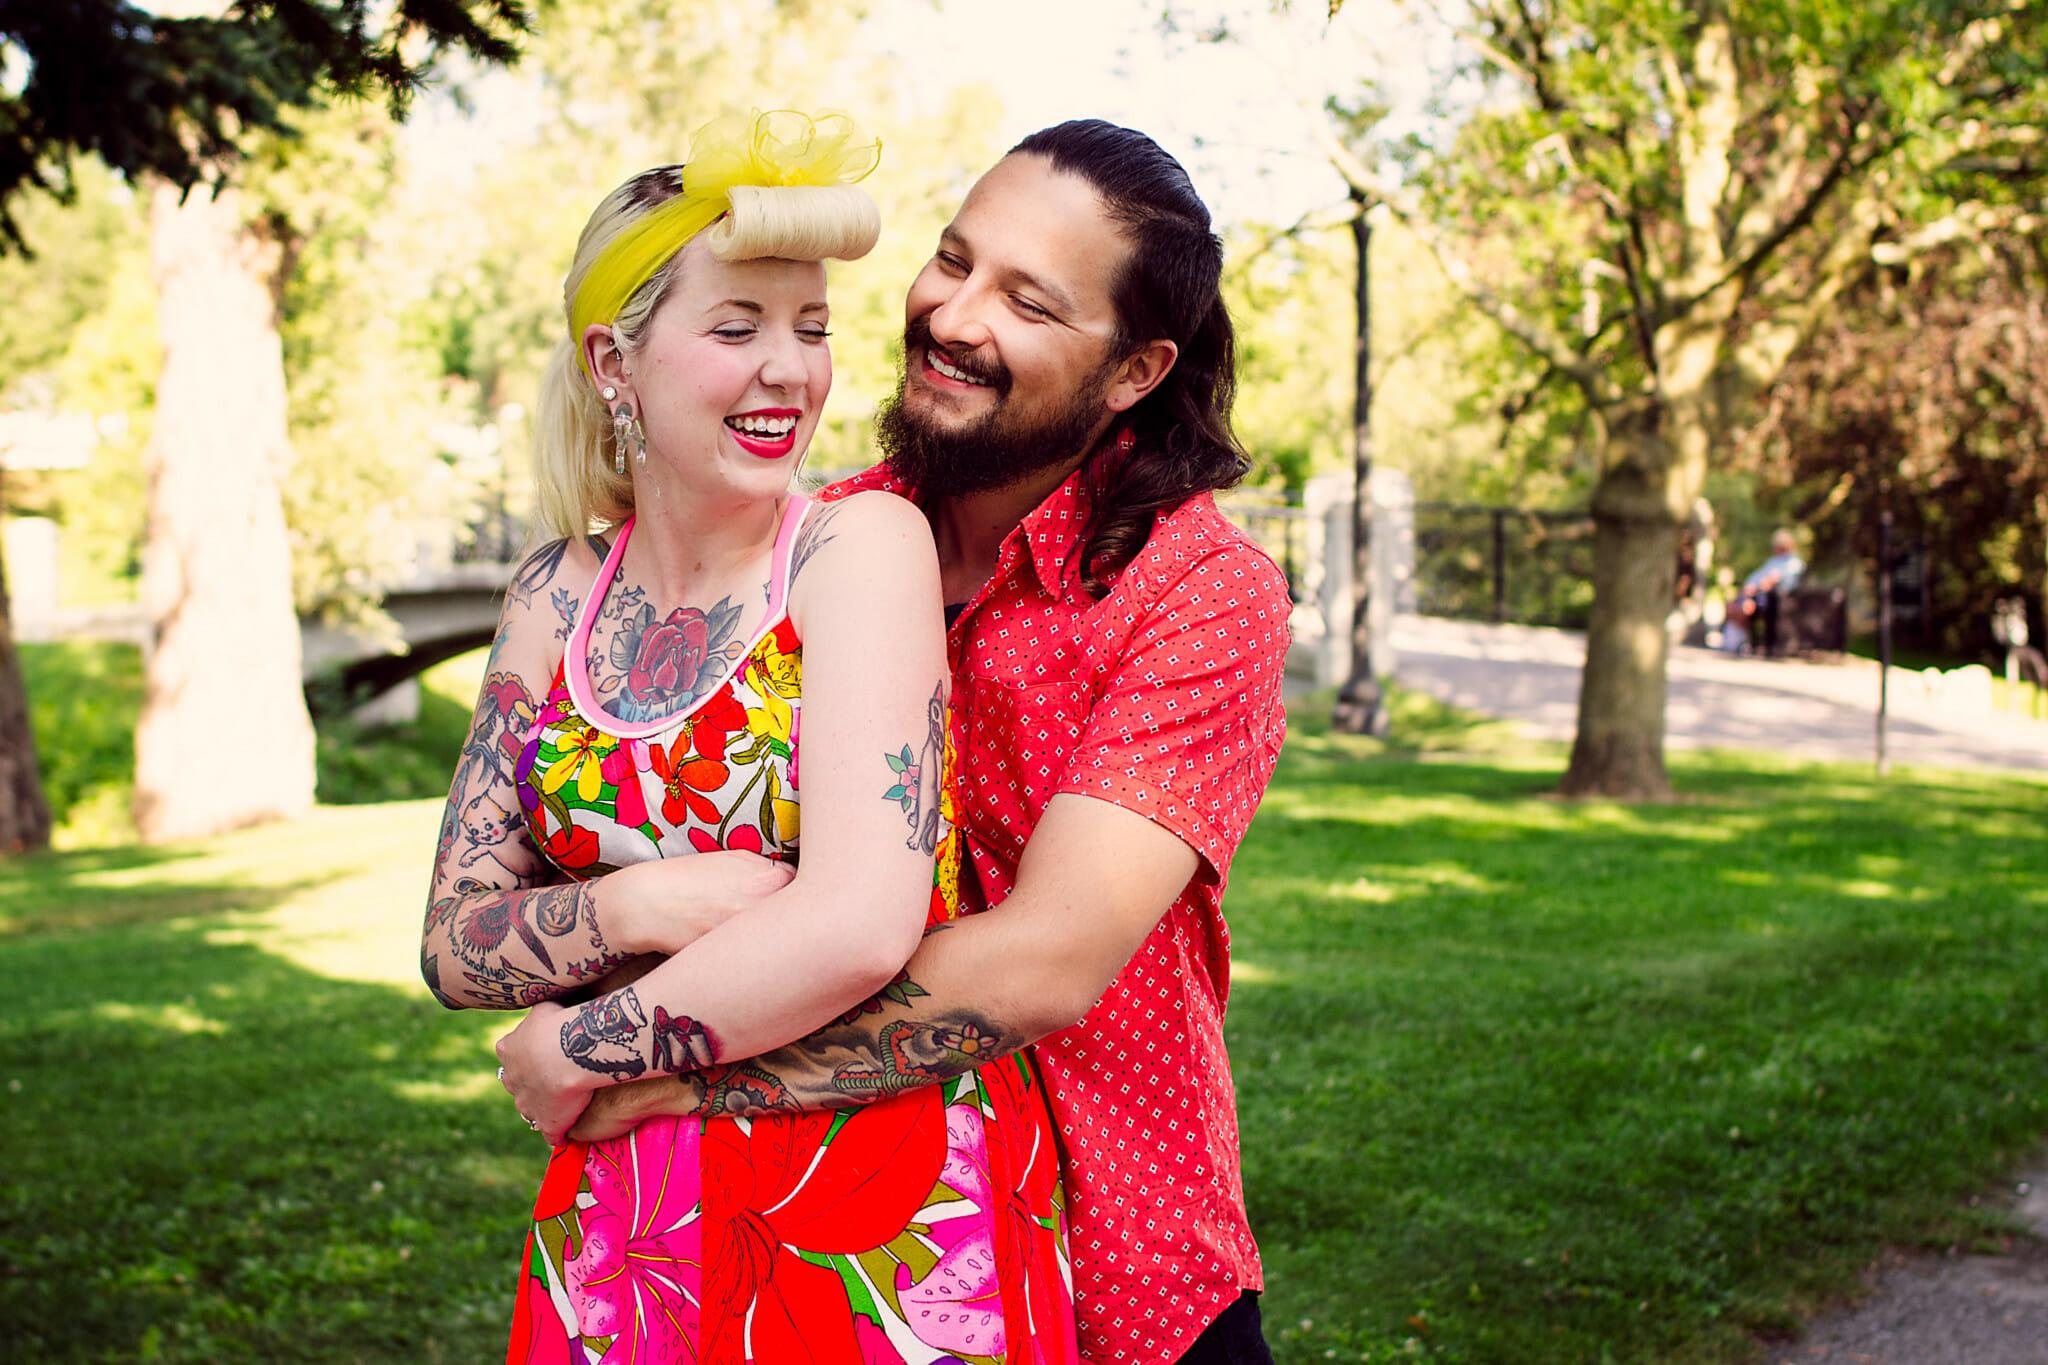 couple laugh in valleyview park photos oshawa